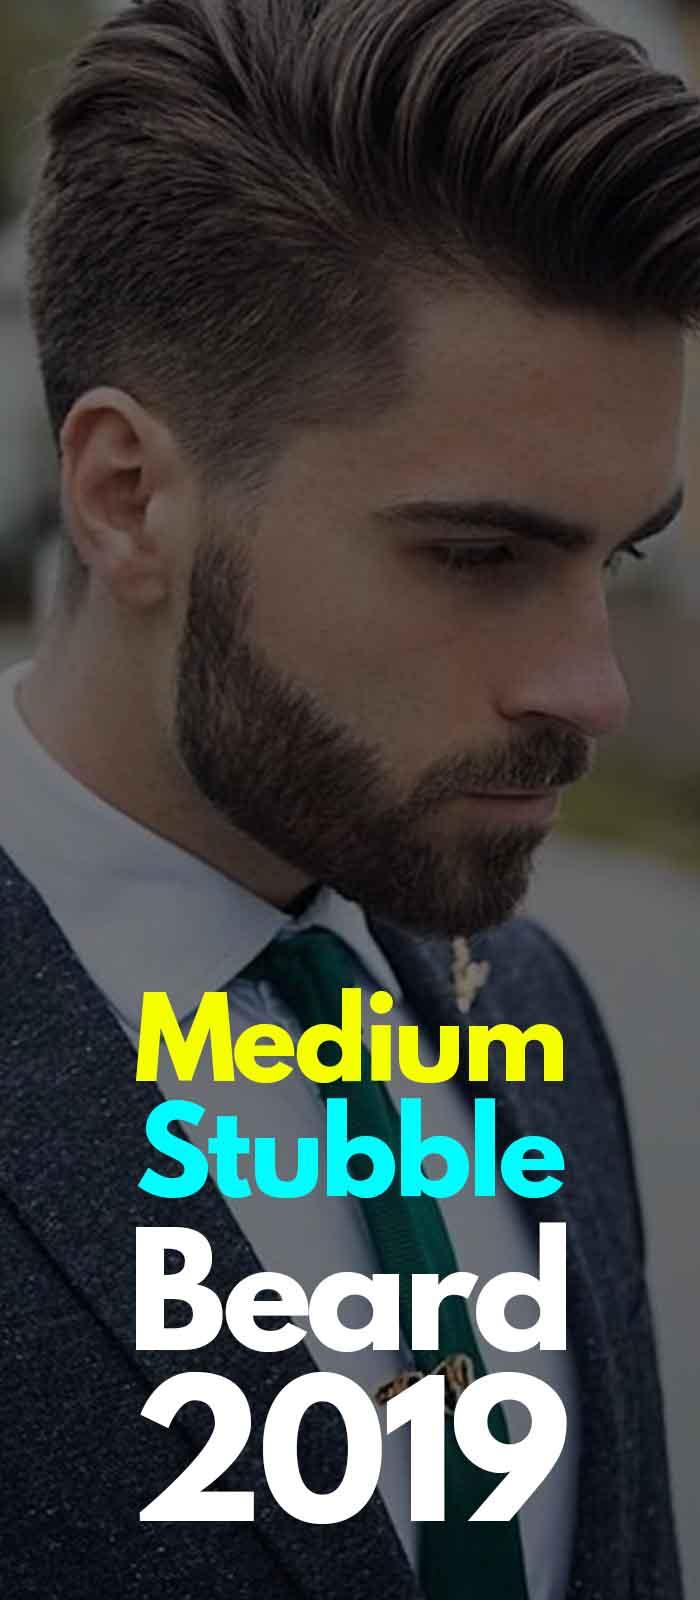 Suit Look for men with Medium Stubble beard!